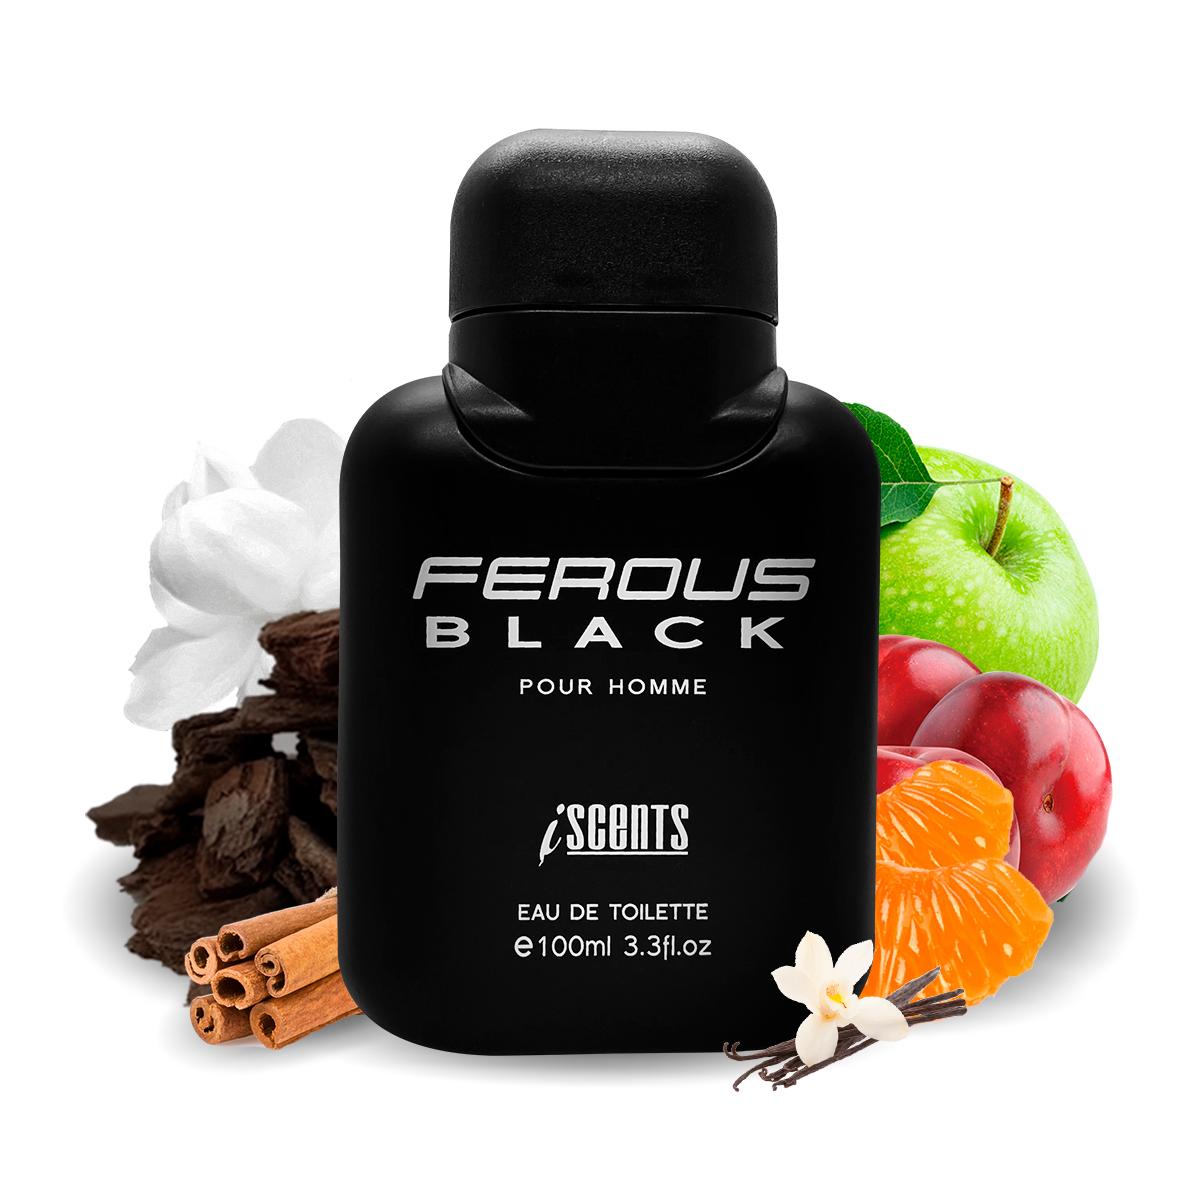 Kit 2 Perfumes Importados Chic e Ferous Black I Scents